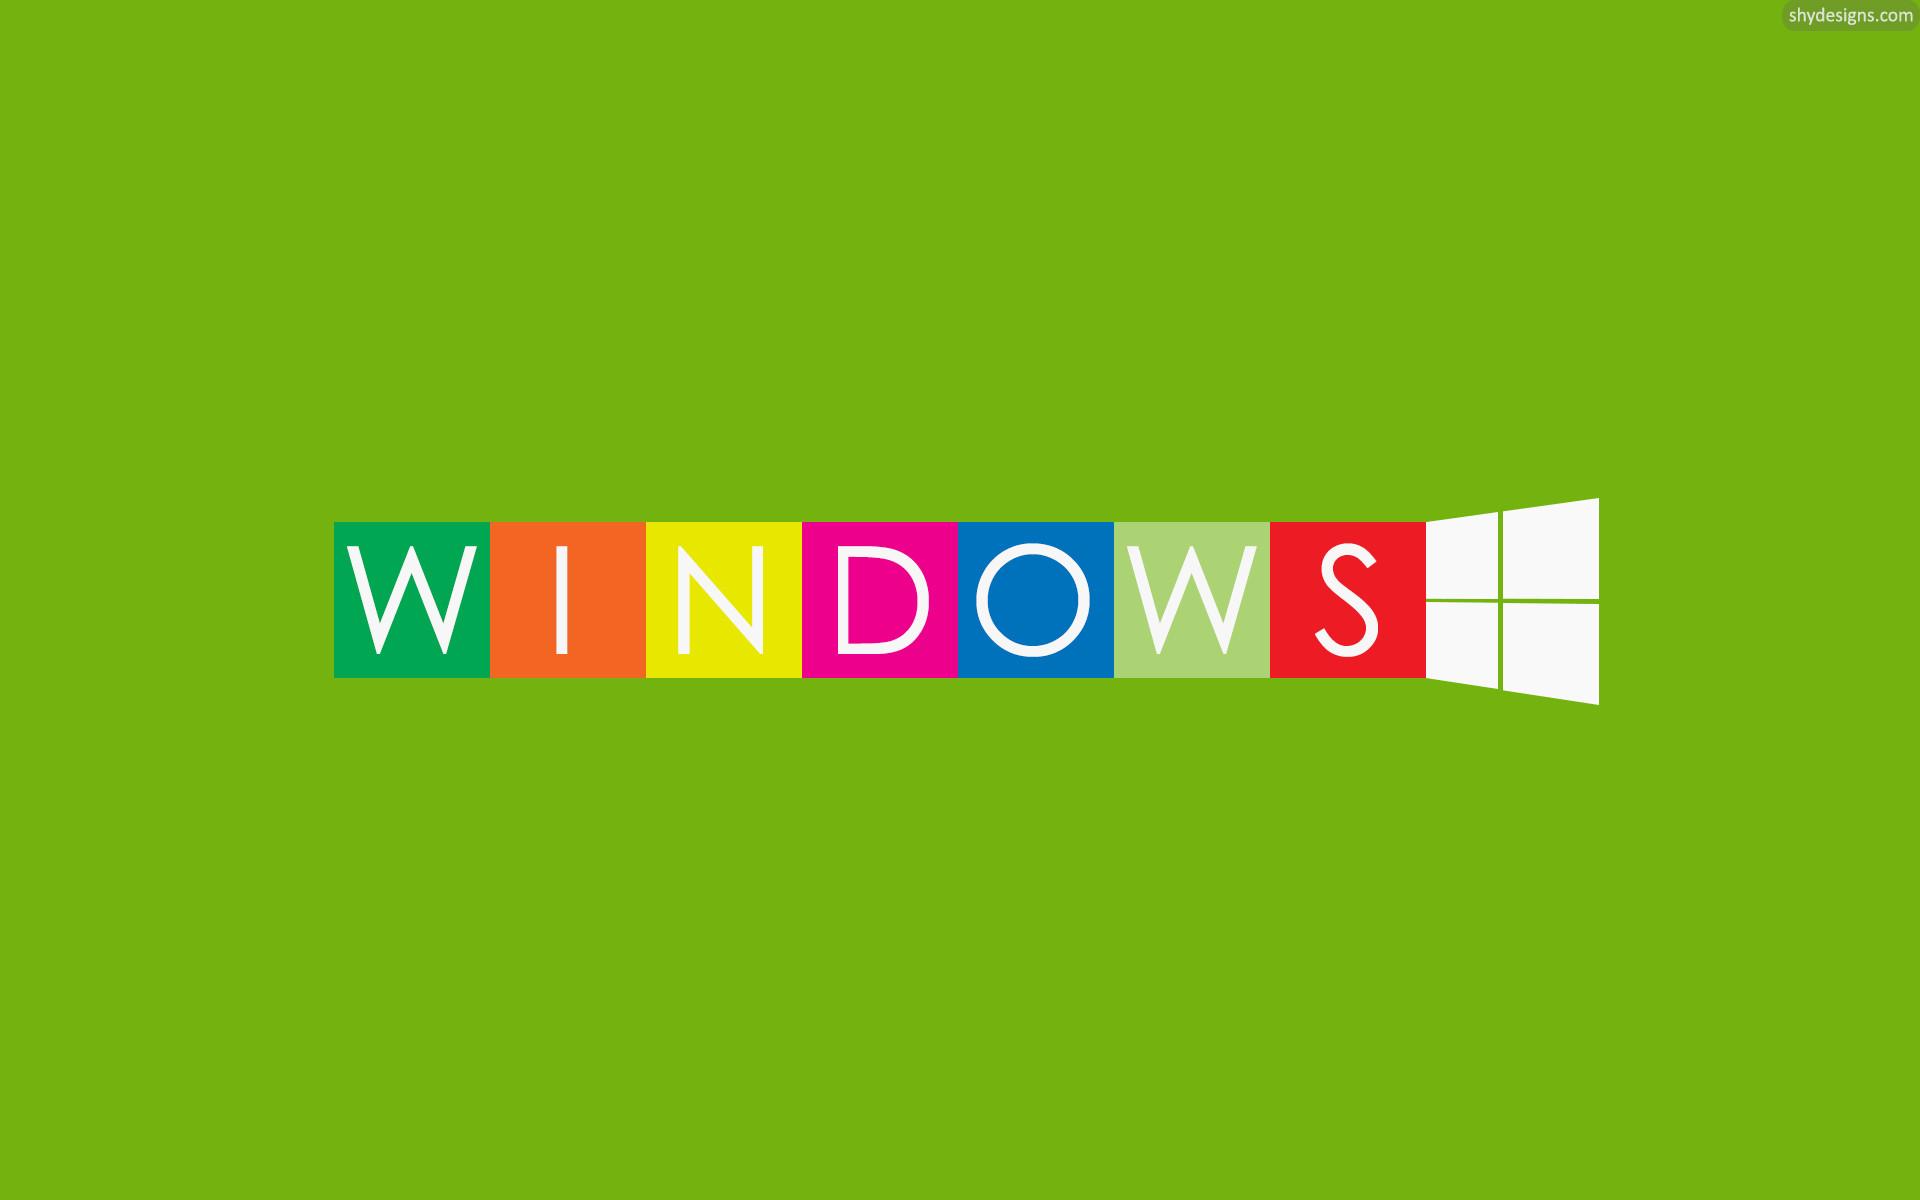 Windows 8.1 HD Wallpapers 1920X1080 – WallpaperSafari